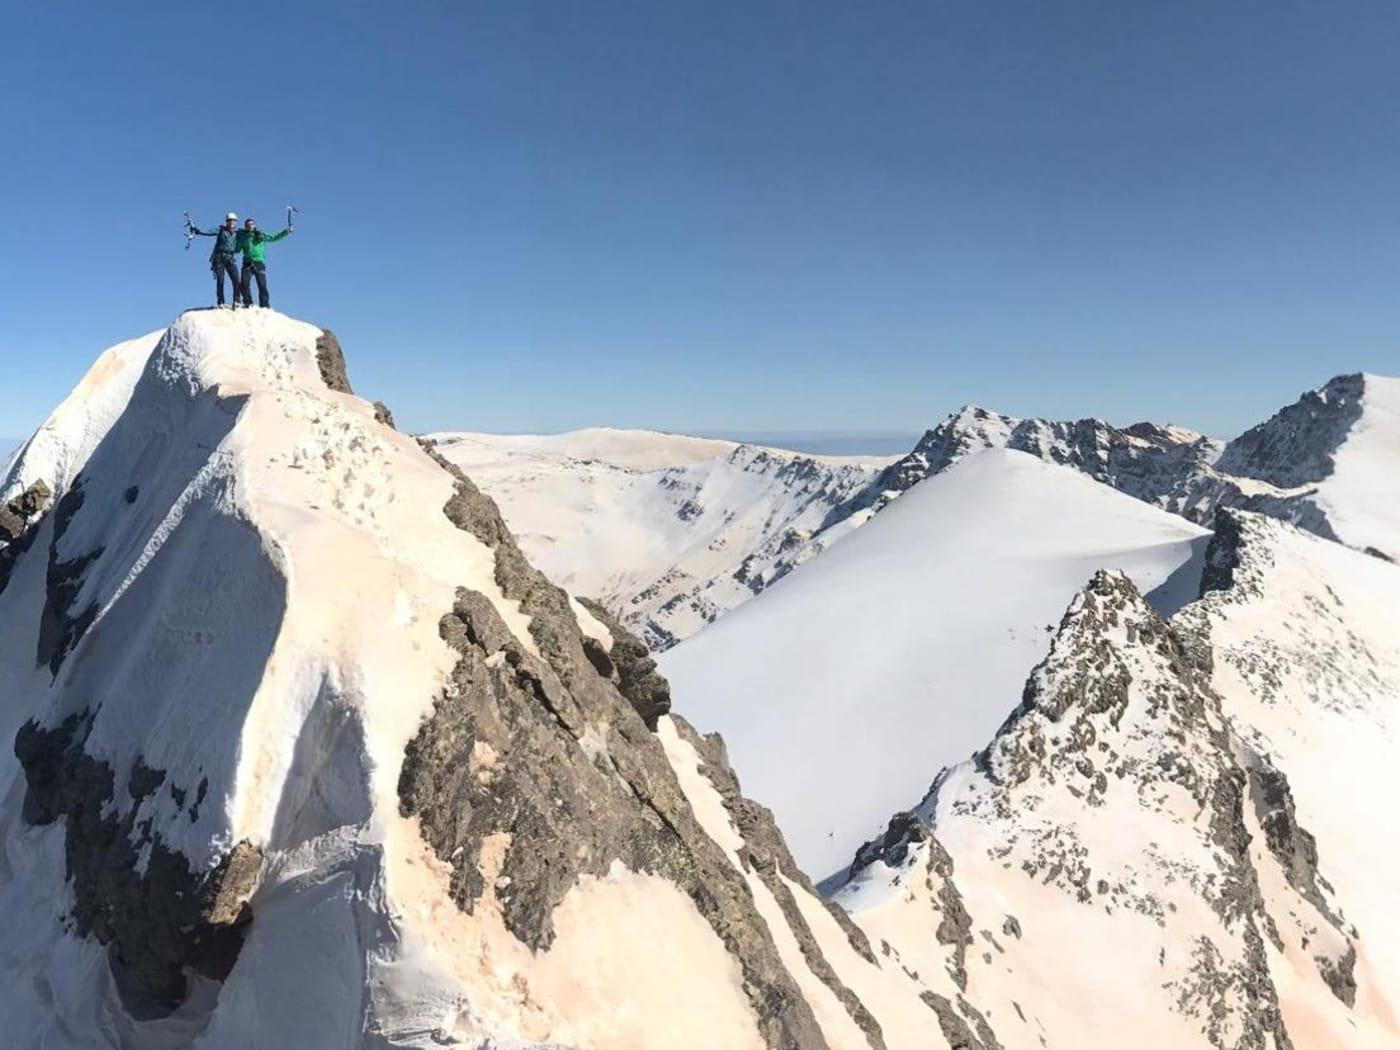 Mountaineering in Spain's Sierra Nevada